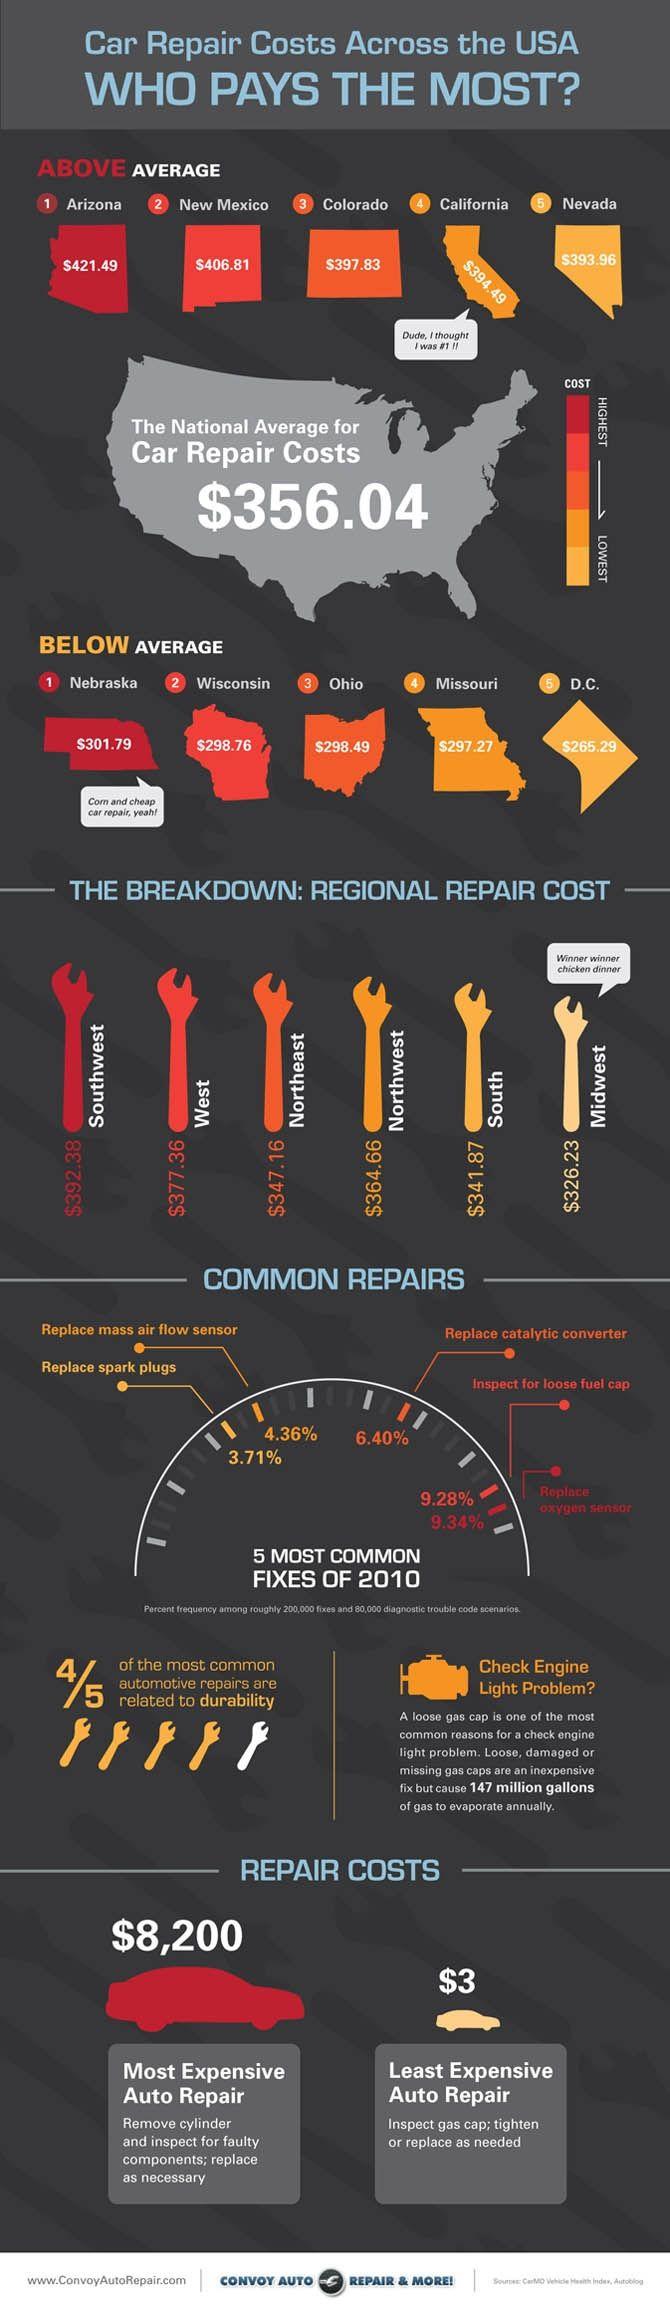 25 best ideas about auto repair shops on pinterest auto repair near me automobile repair. Black Bedroom Furniture Sets. Home Design Ideas